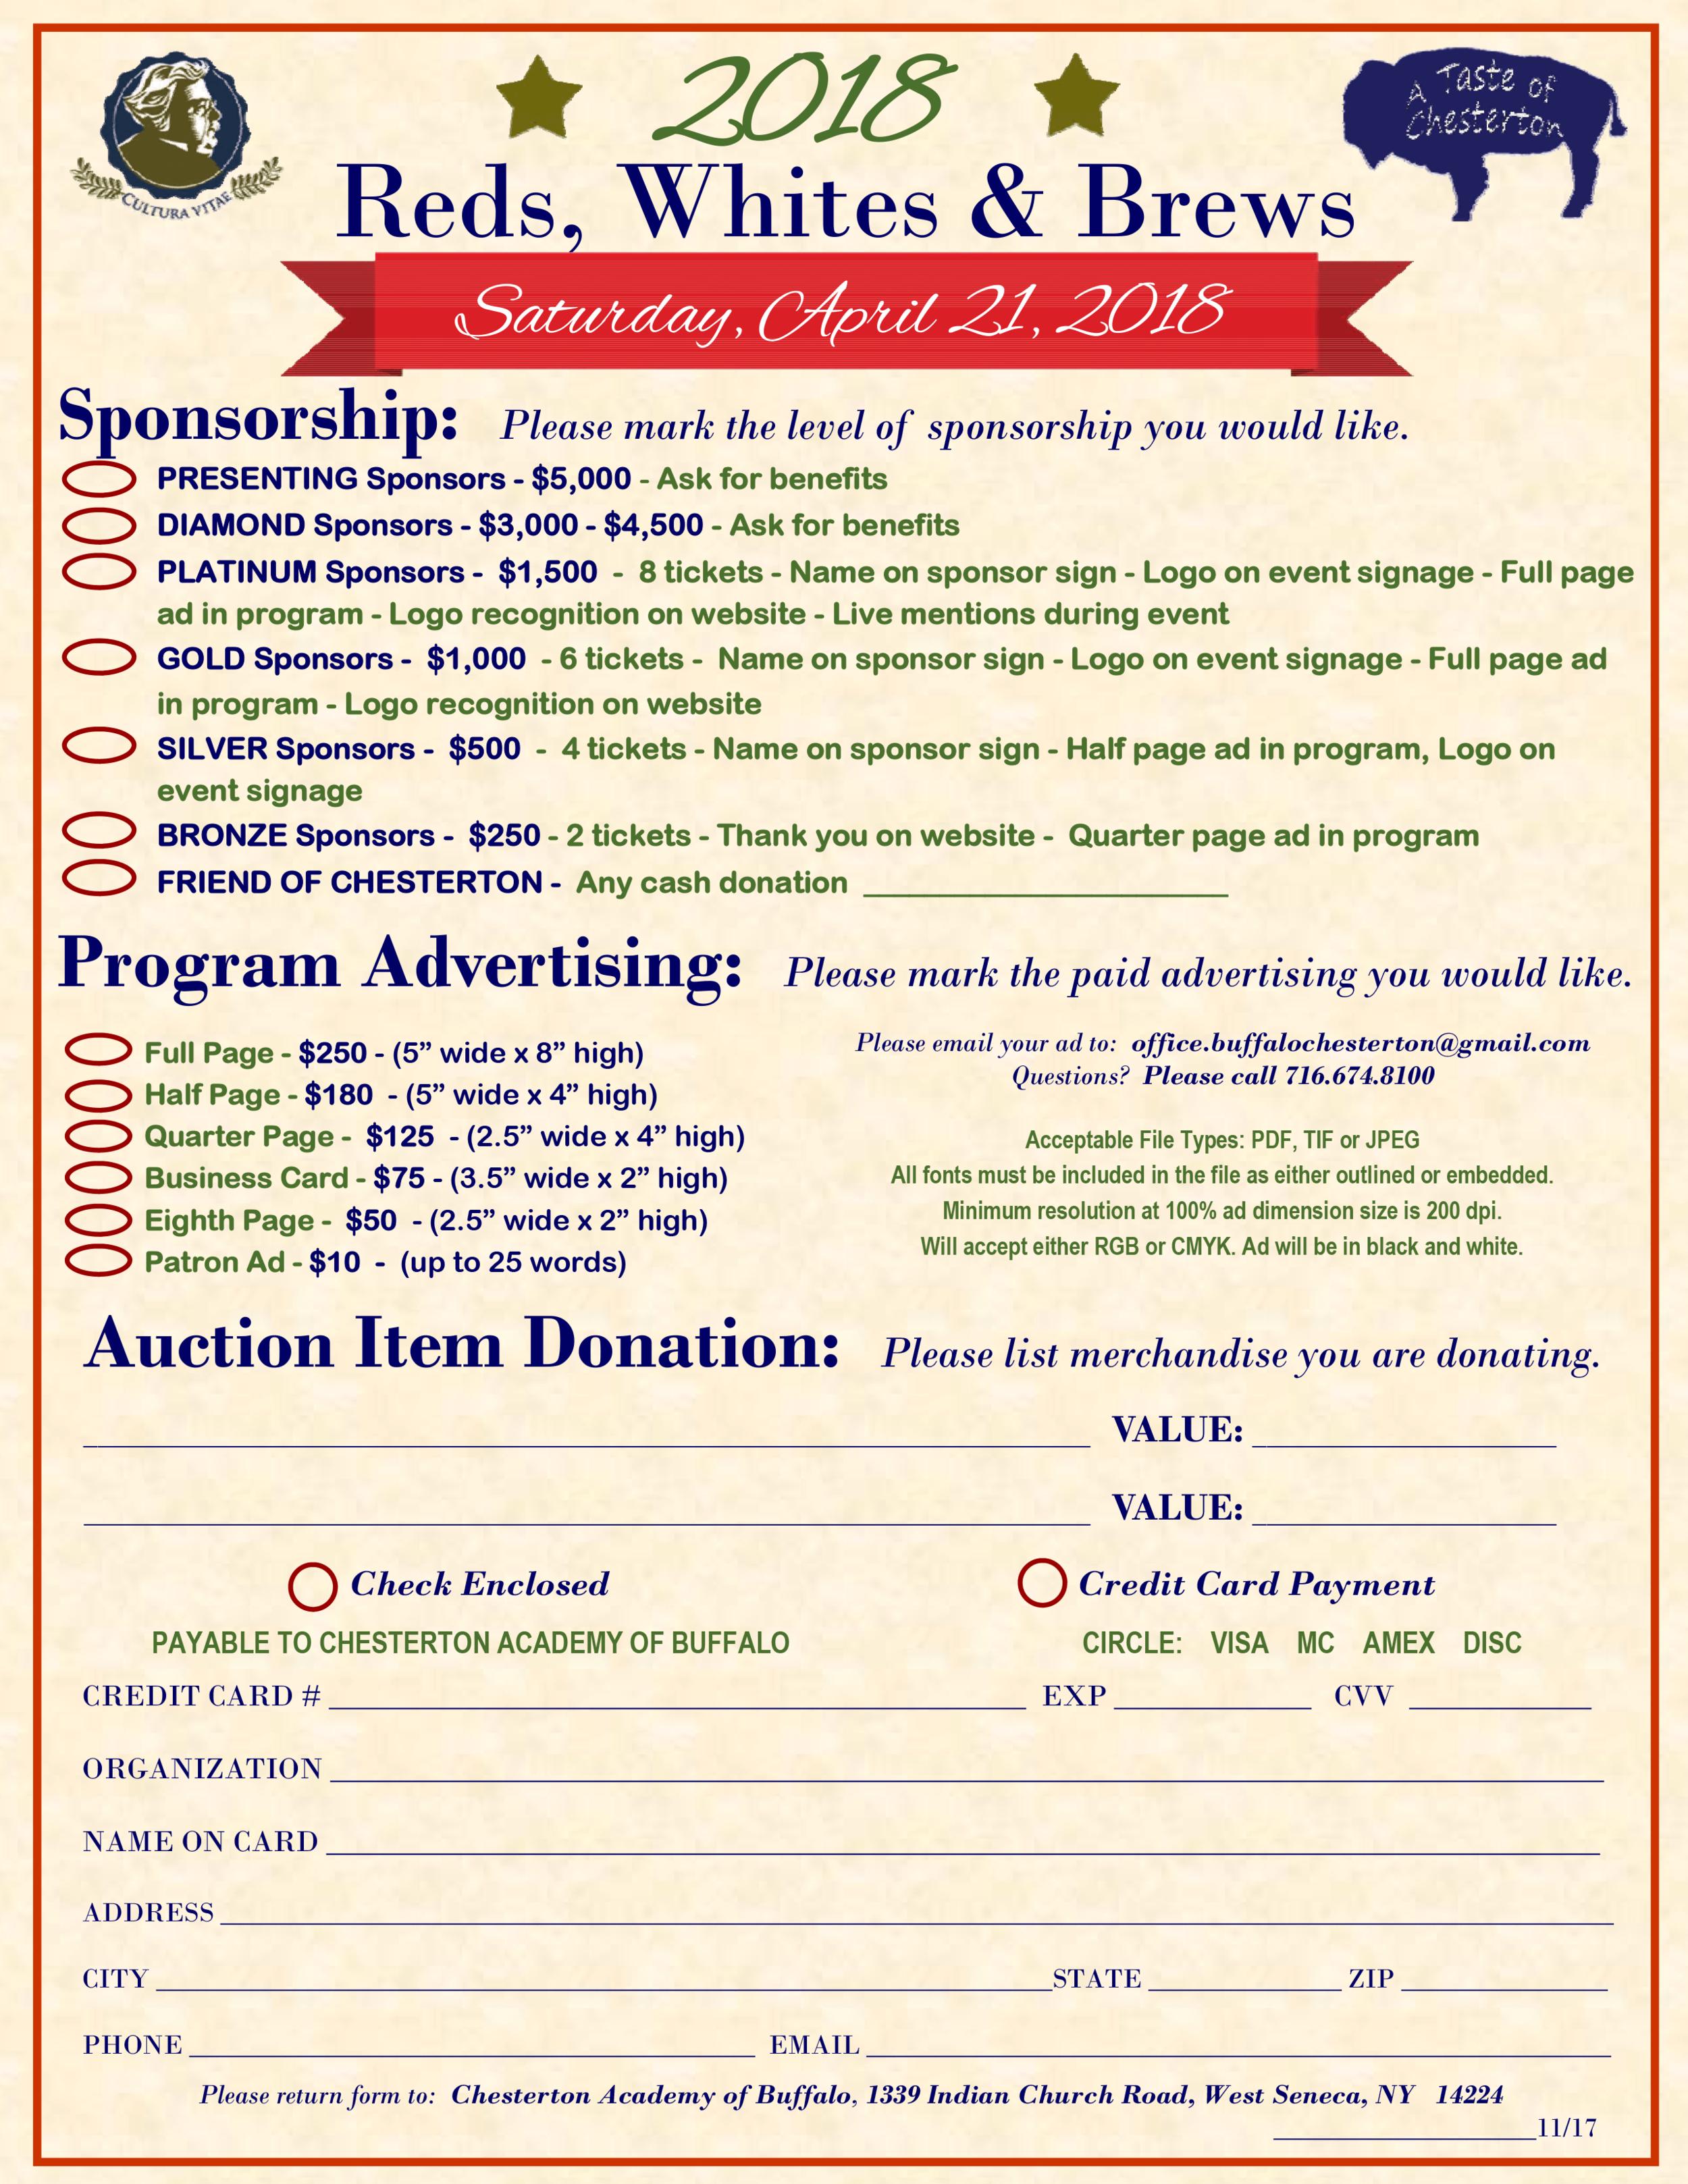 taste-of-chesterton-sponsorship-auction-form.png